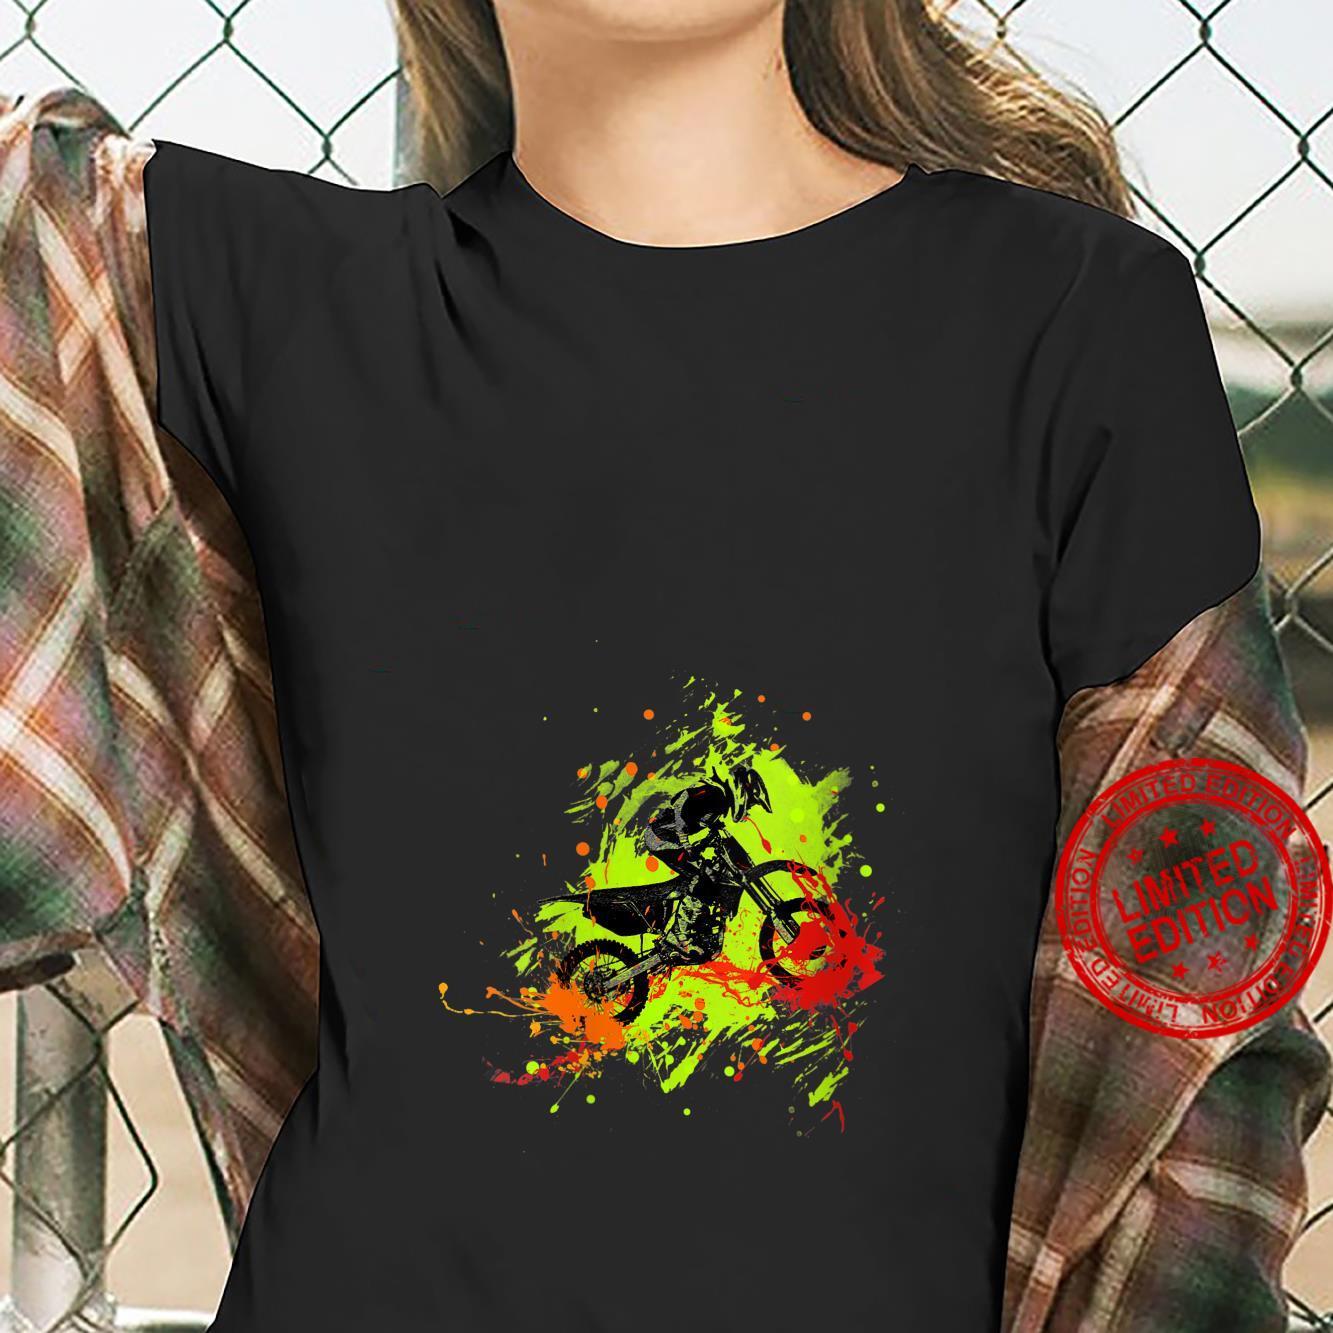 Womens Motocross Dirt Bike racing Shirt ladies tee